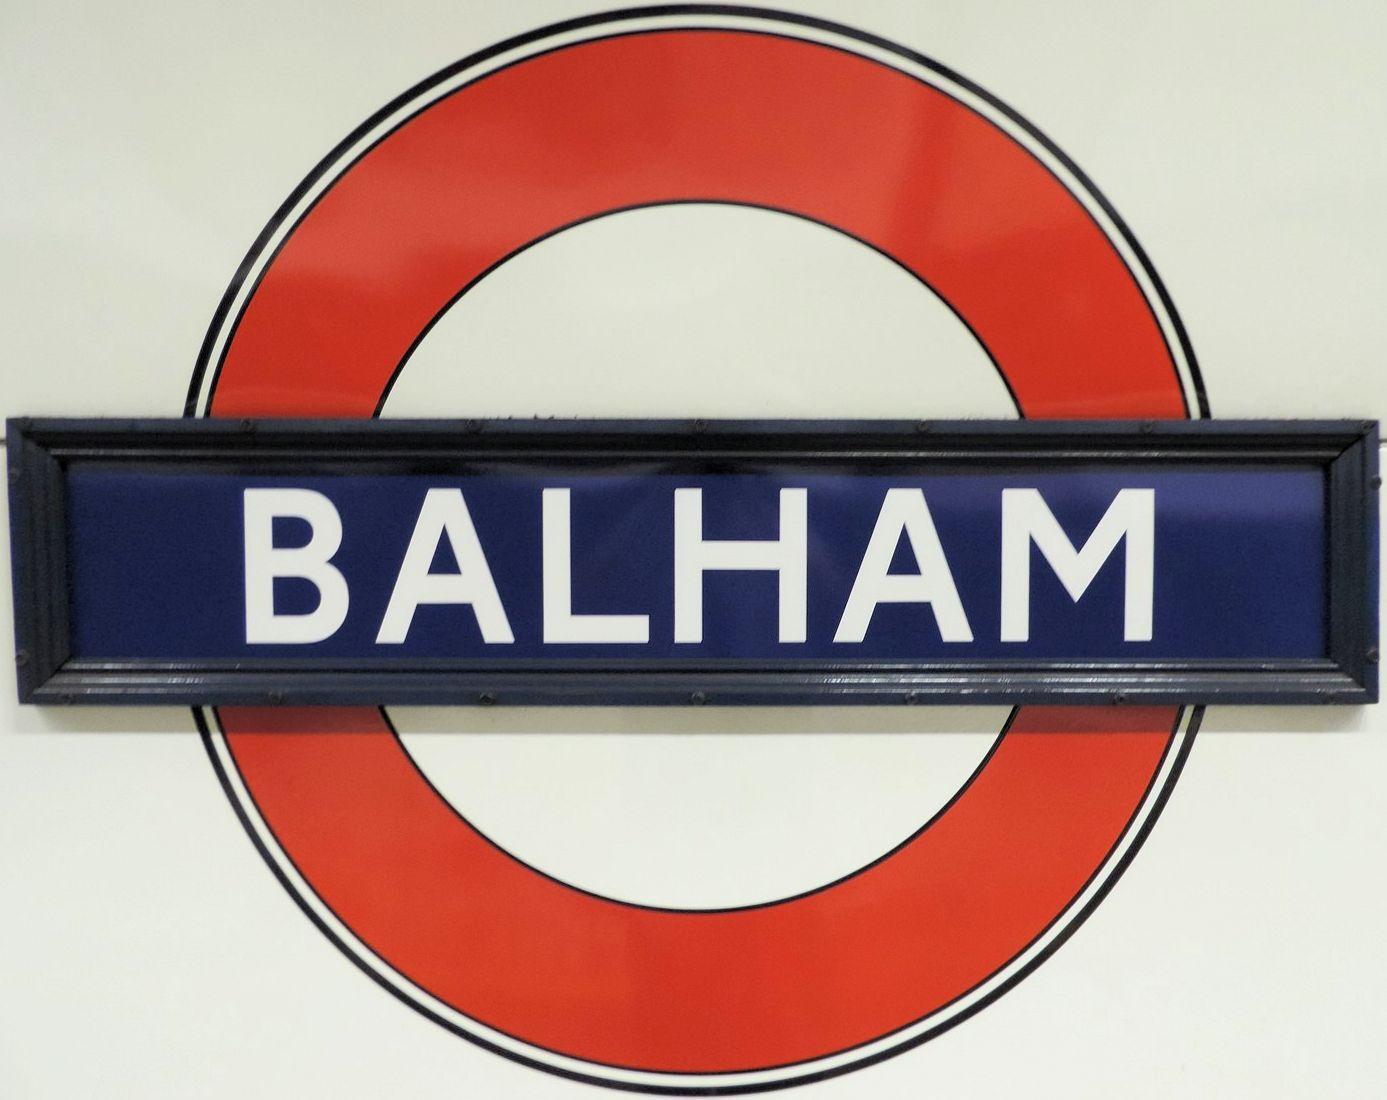 Balham Underground Station Balham High Road London Uk The